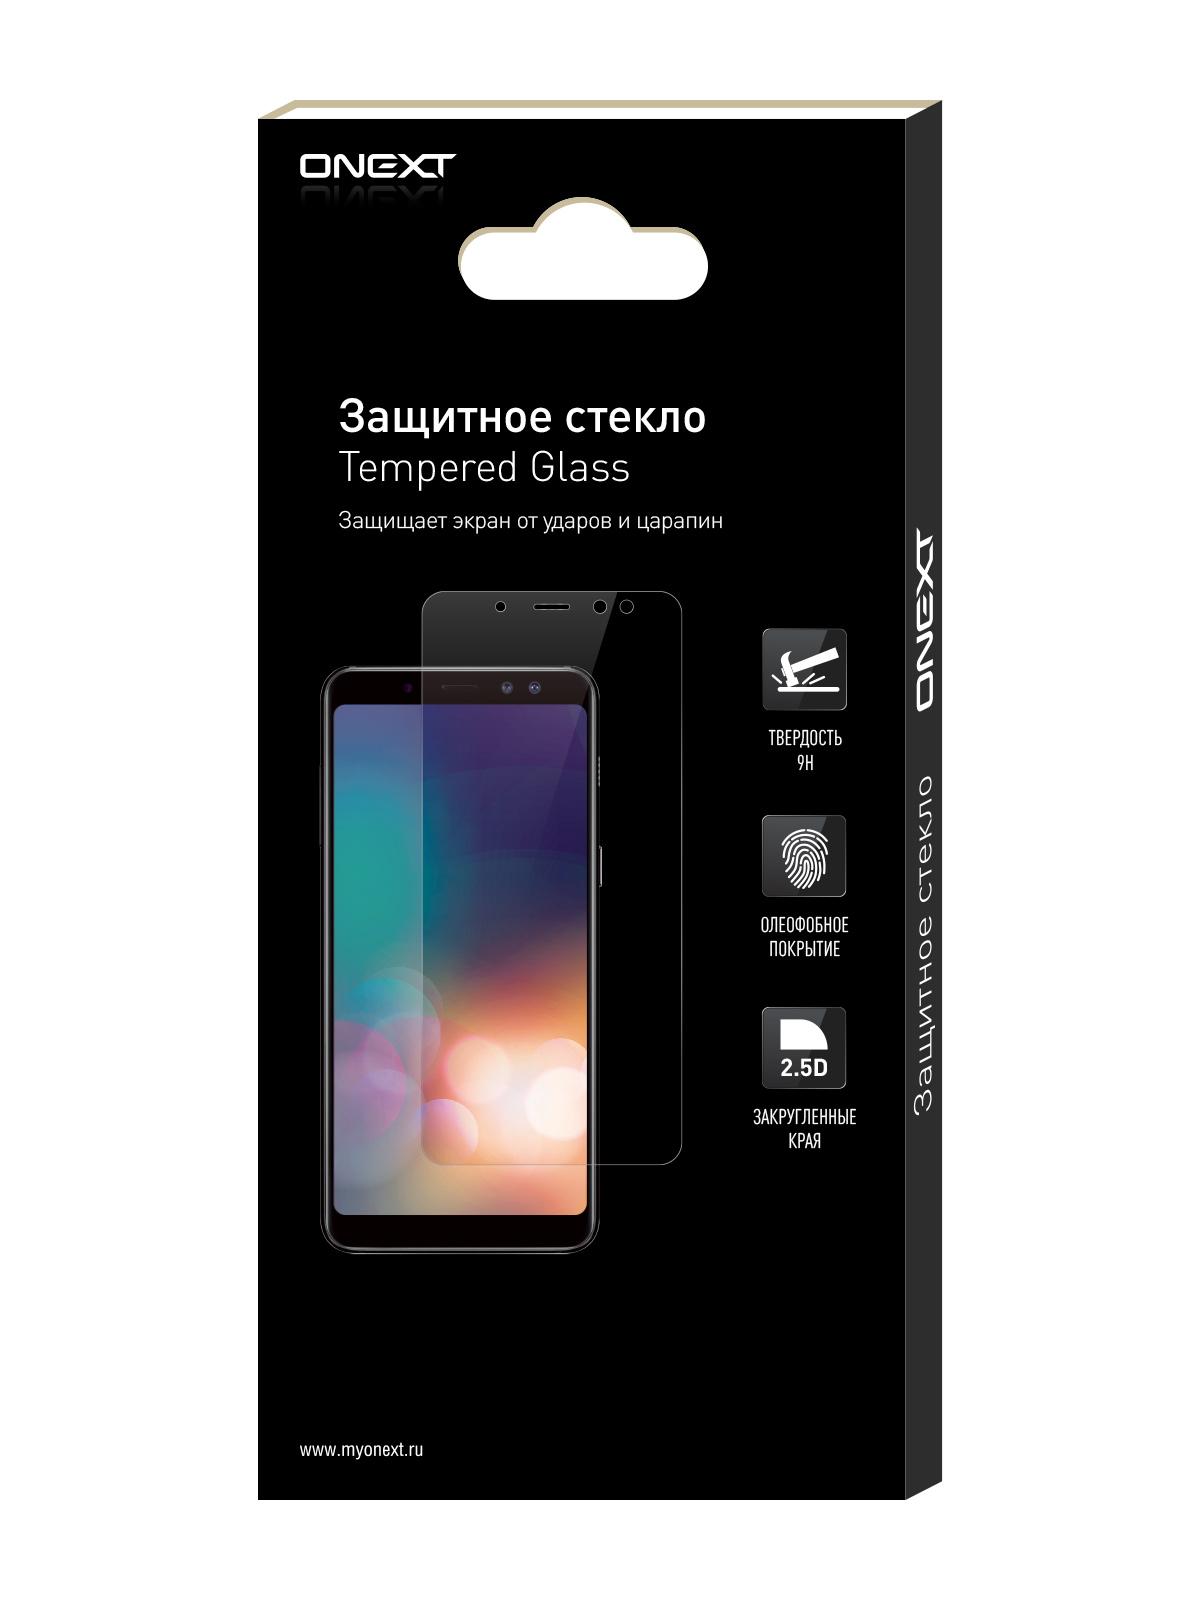 Защитное стекло ONEXT для Asus ZenFone 3 (ZE520KL)